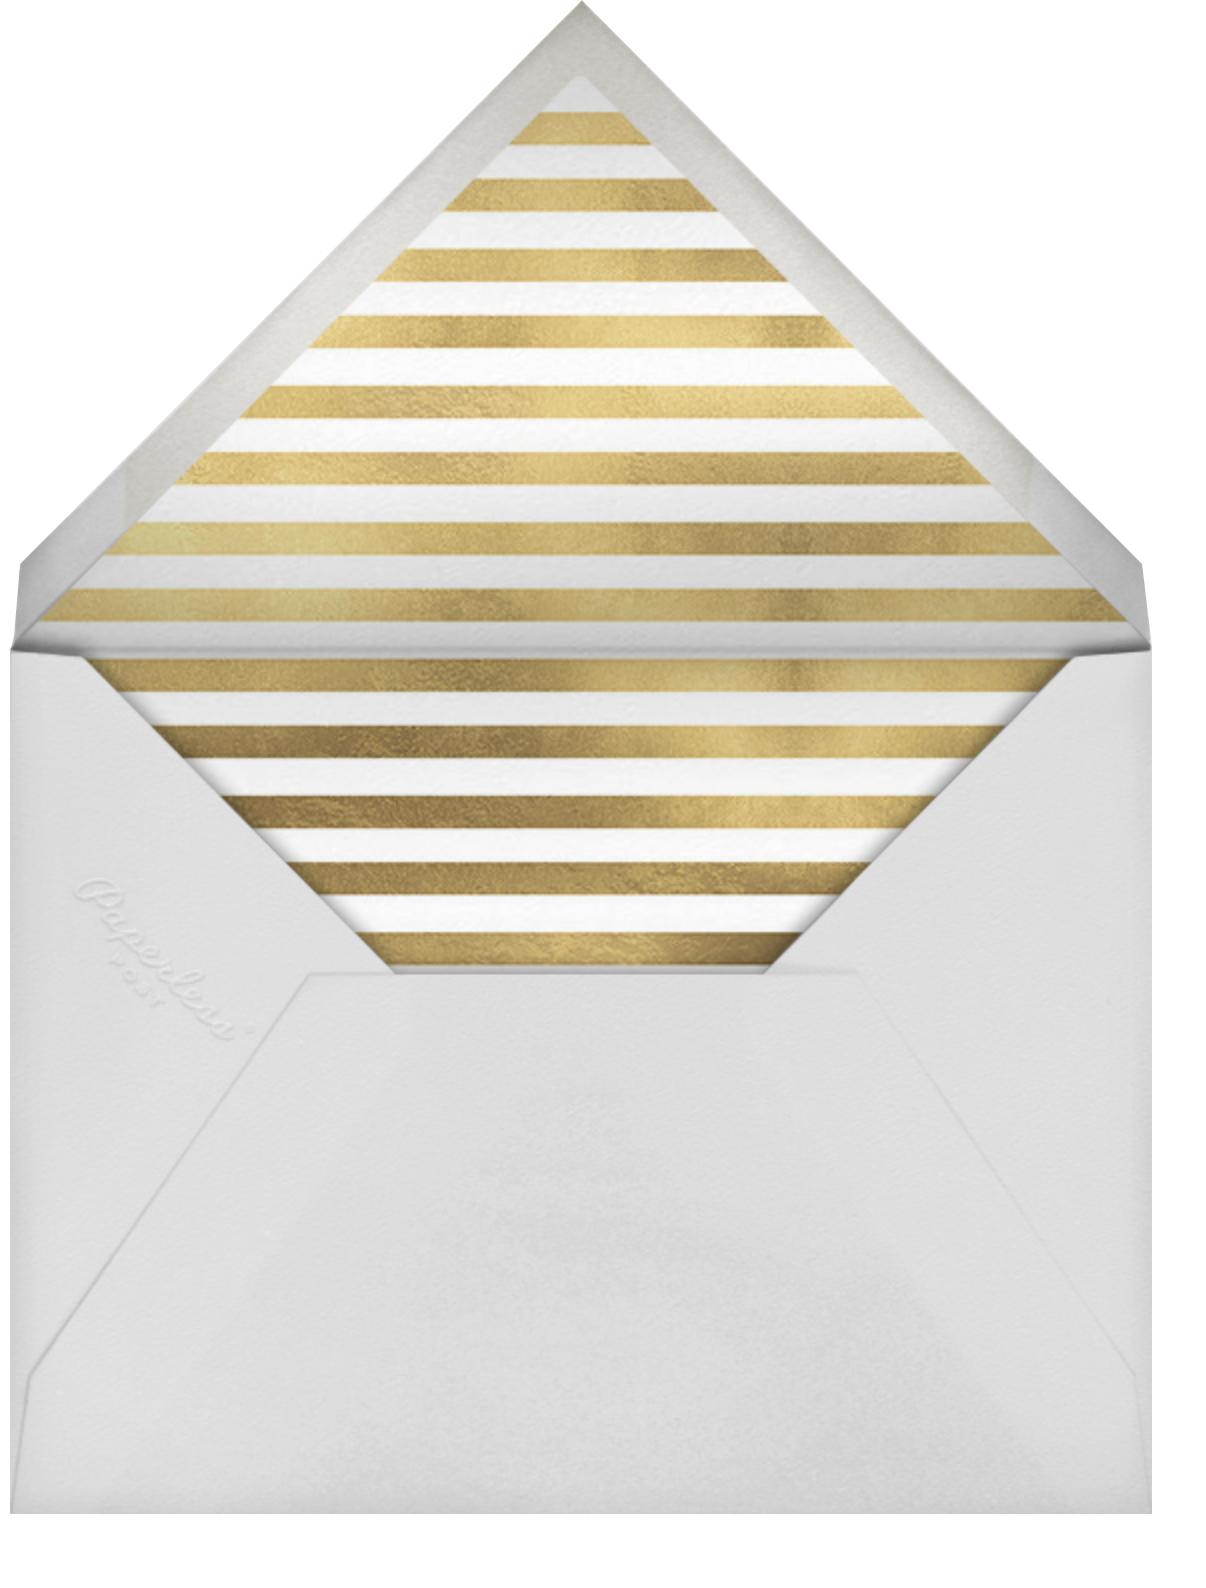 Intarsia Scallop - Mint - kate spade new york - Easter - envelope back